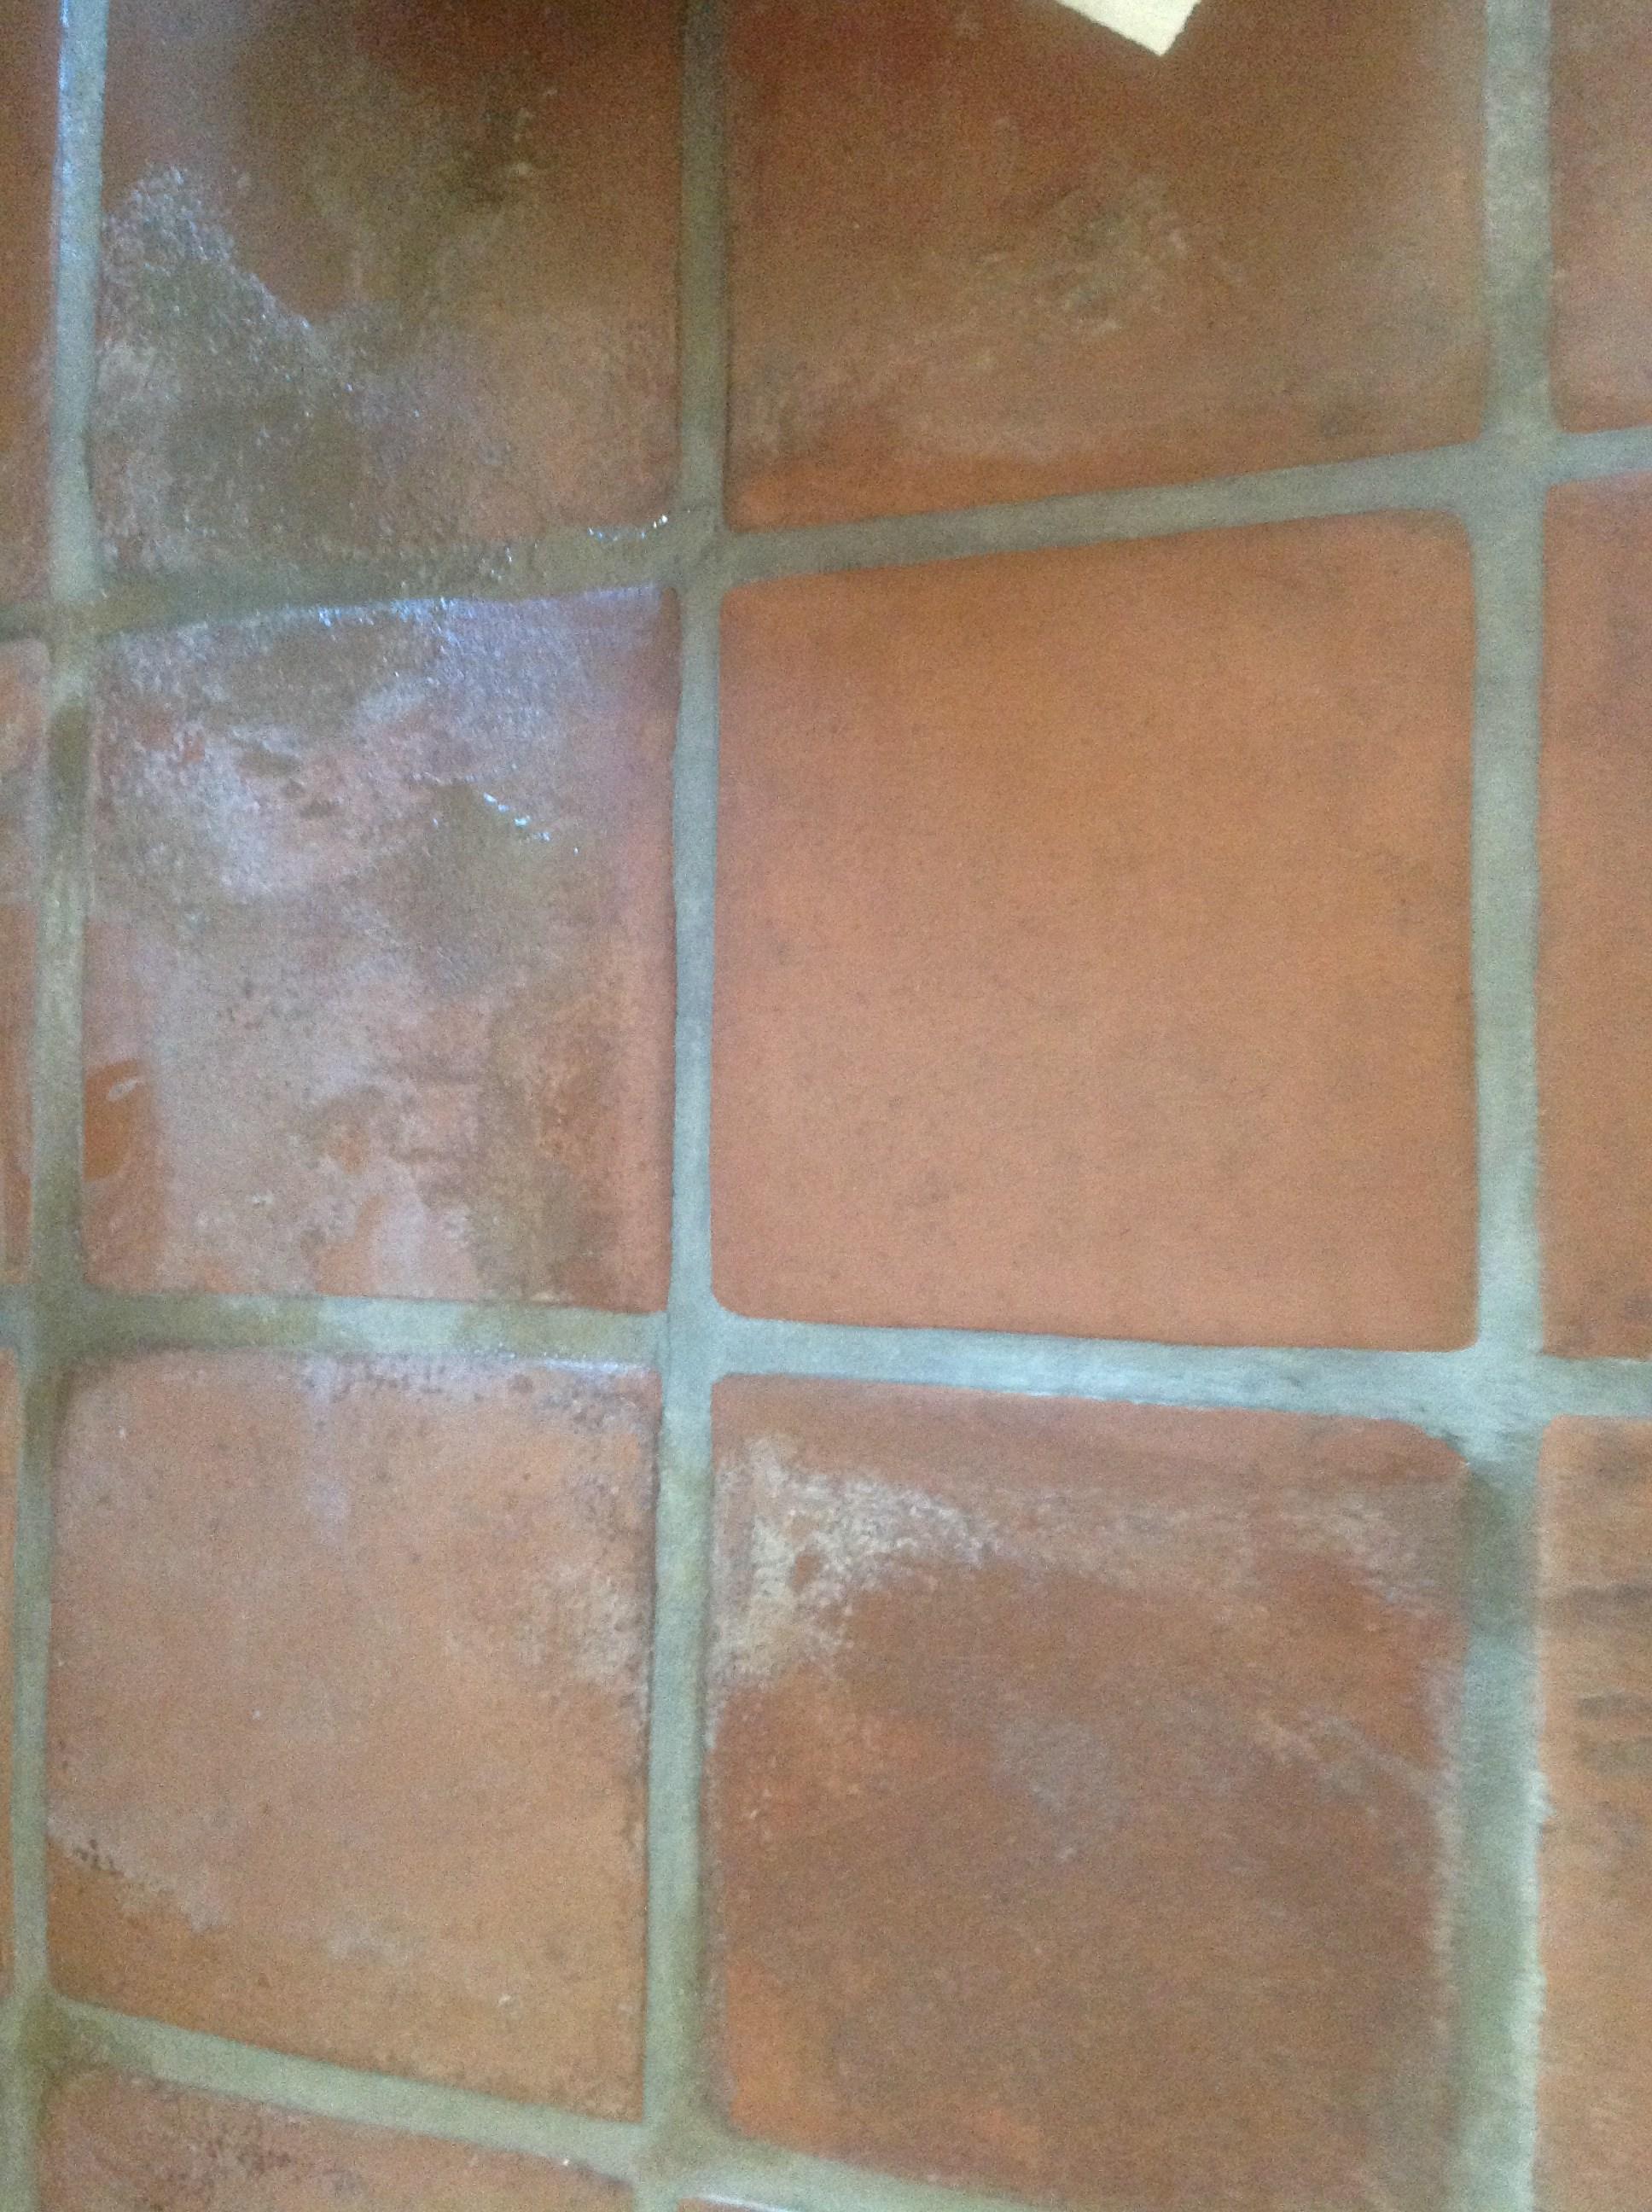 Efflorescence Removal Tile Water Damage California